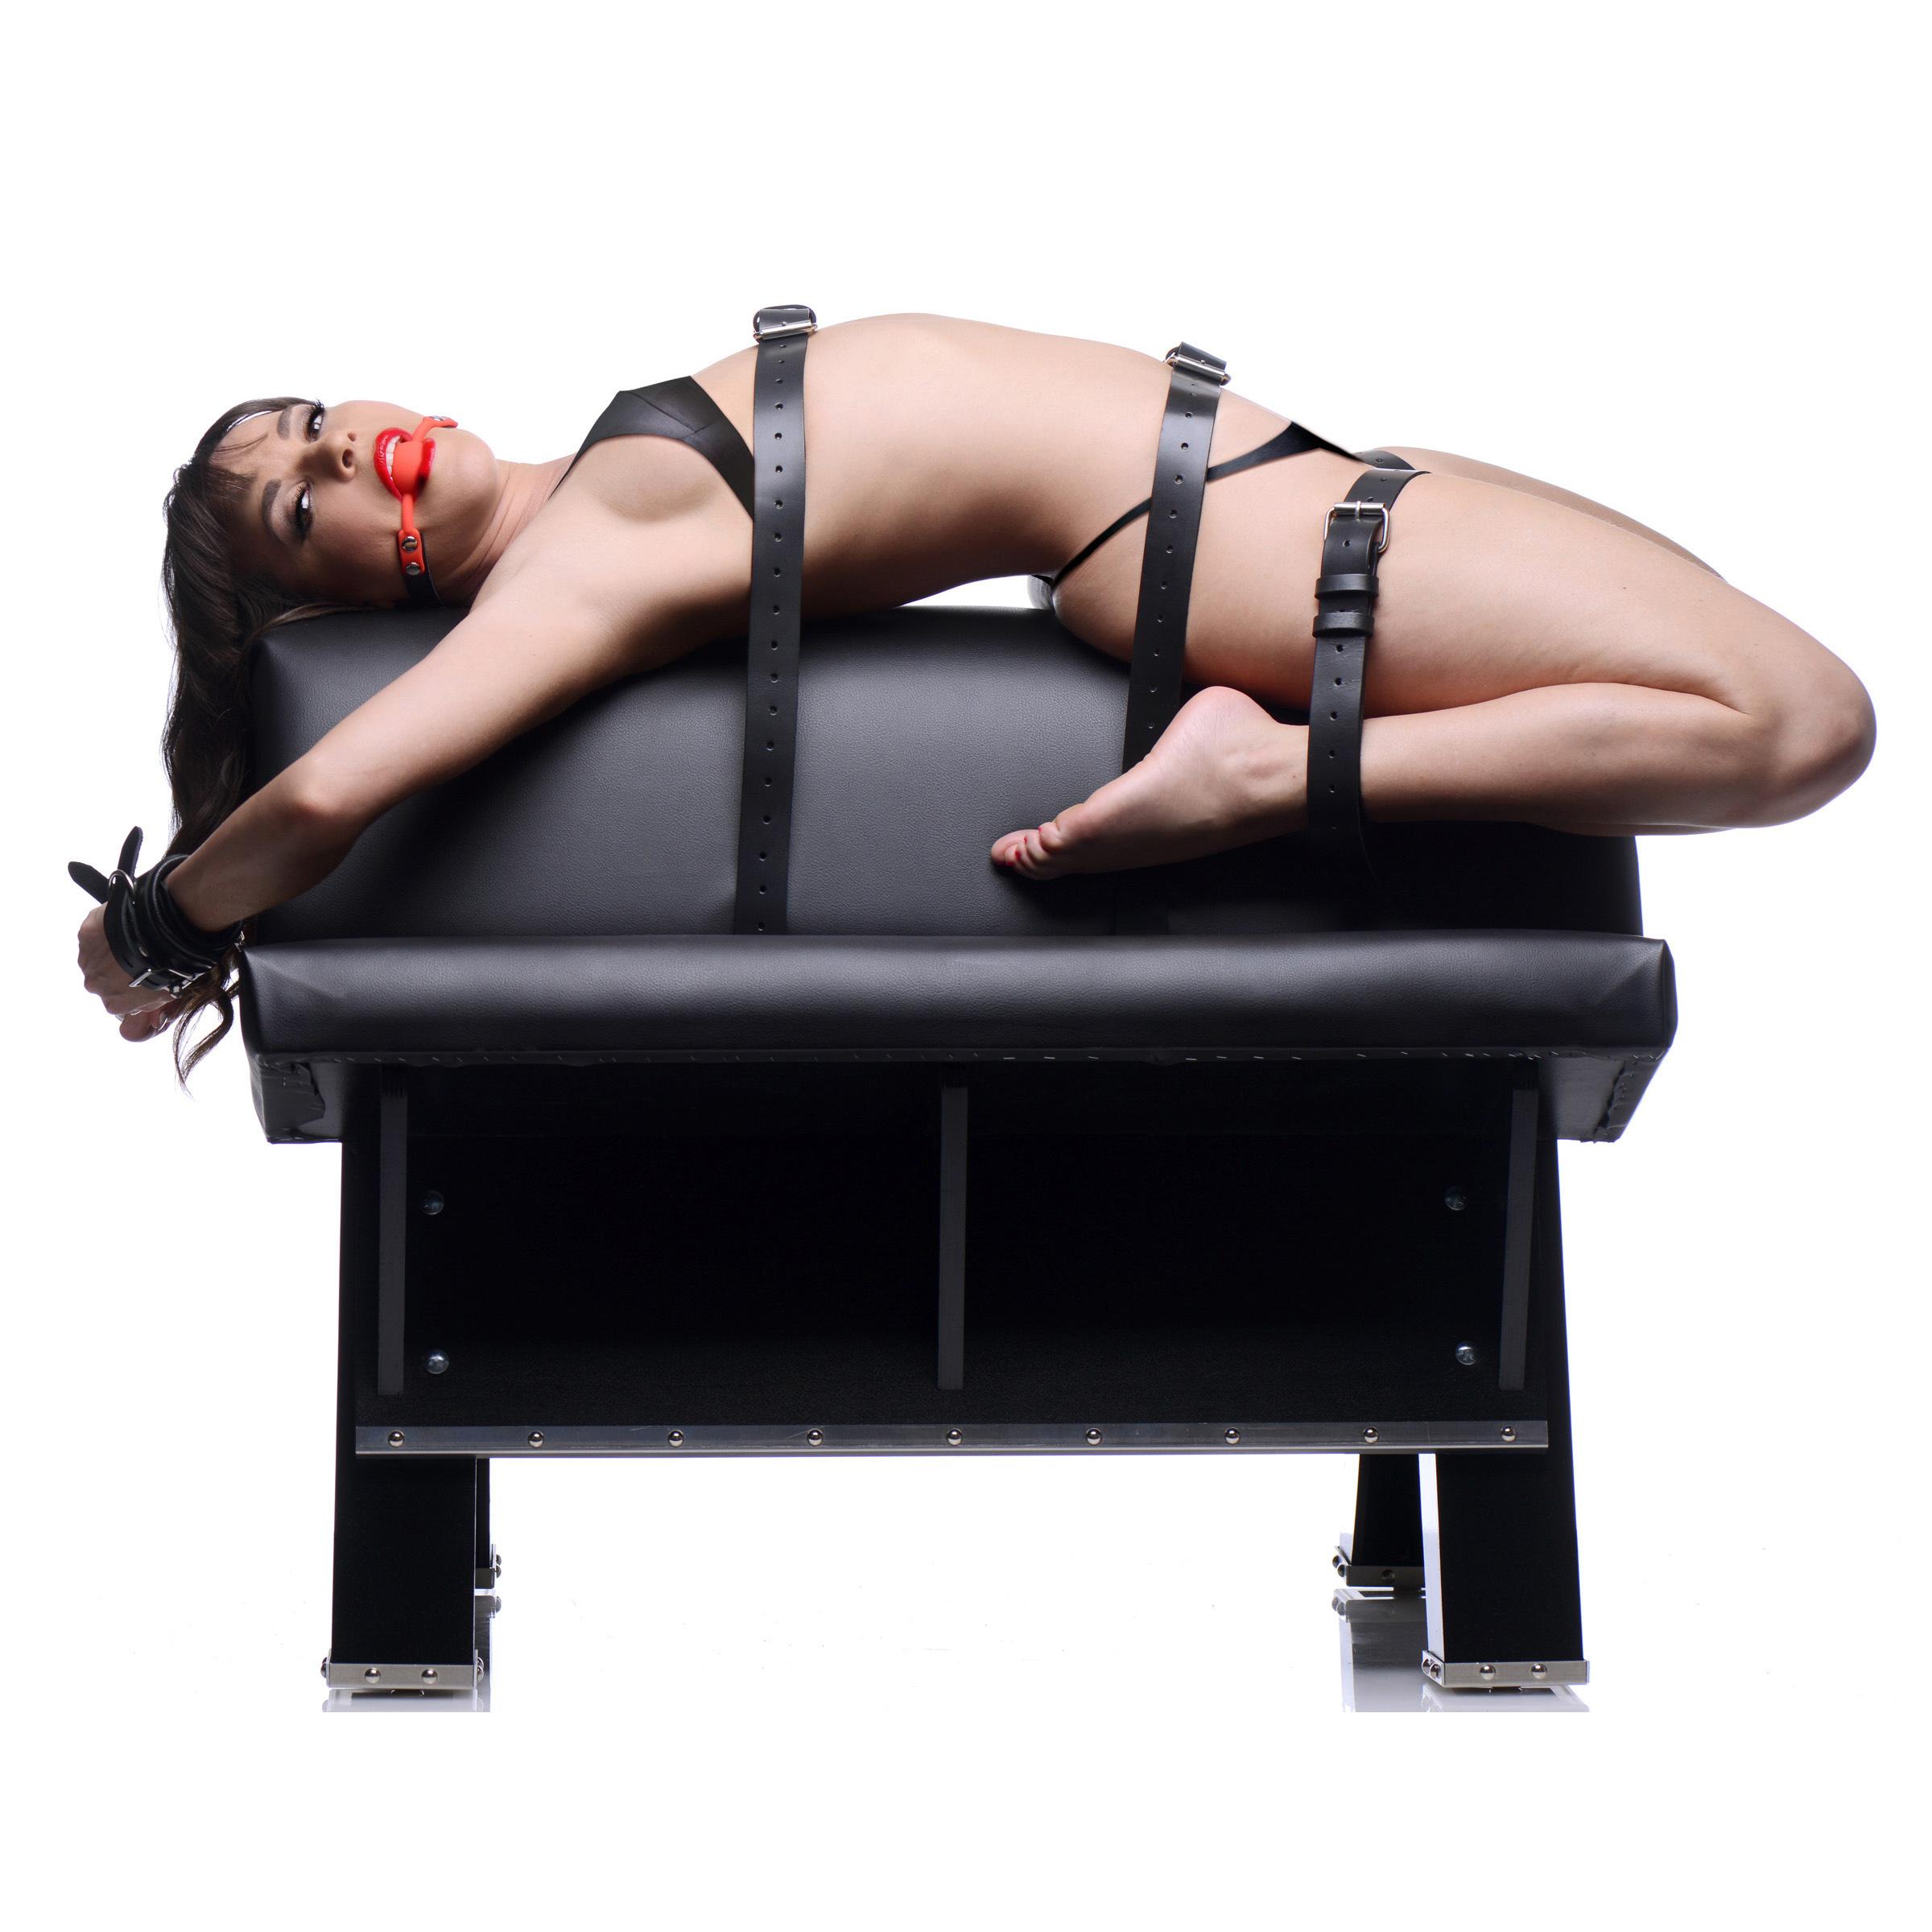 Bdsm furniture stands sadolair